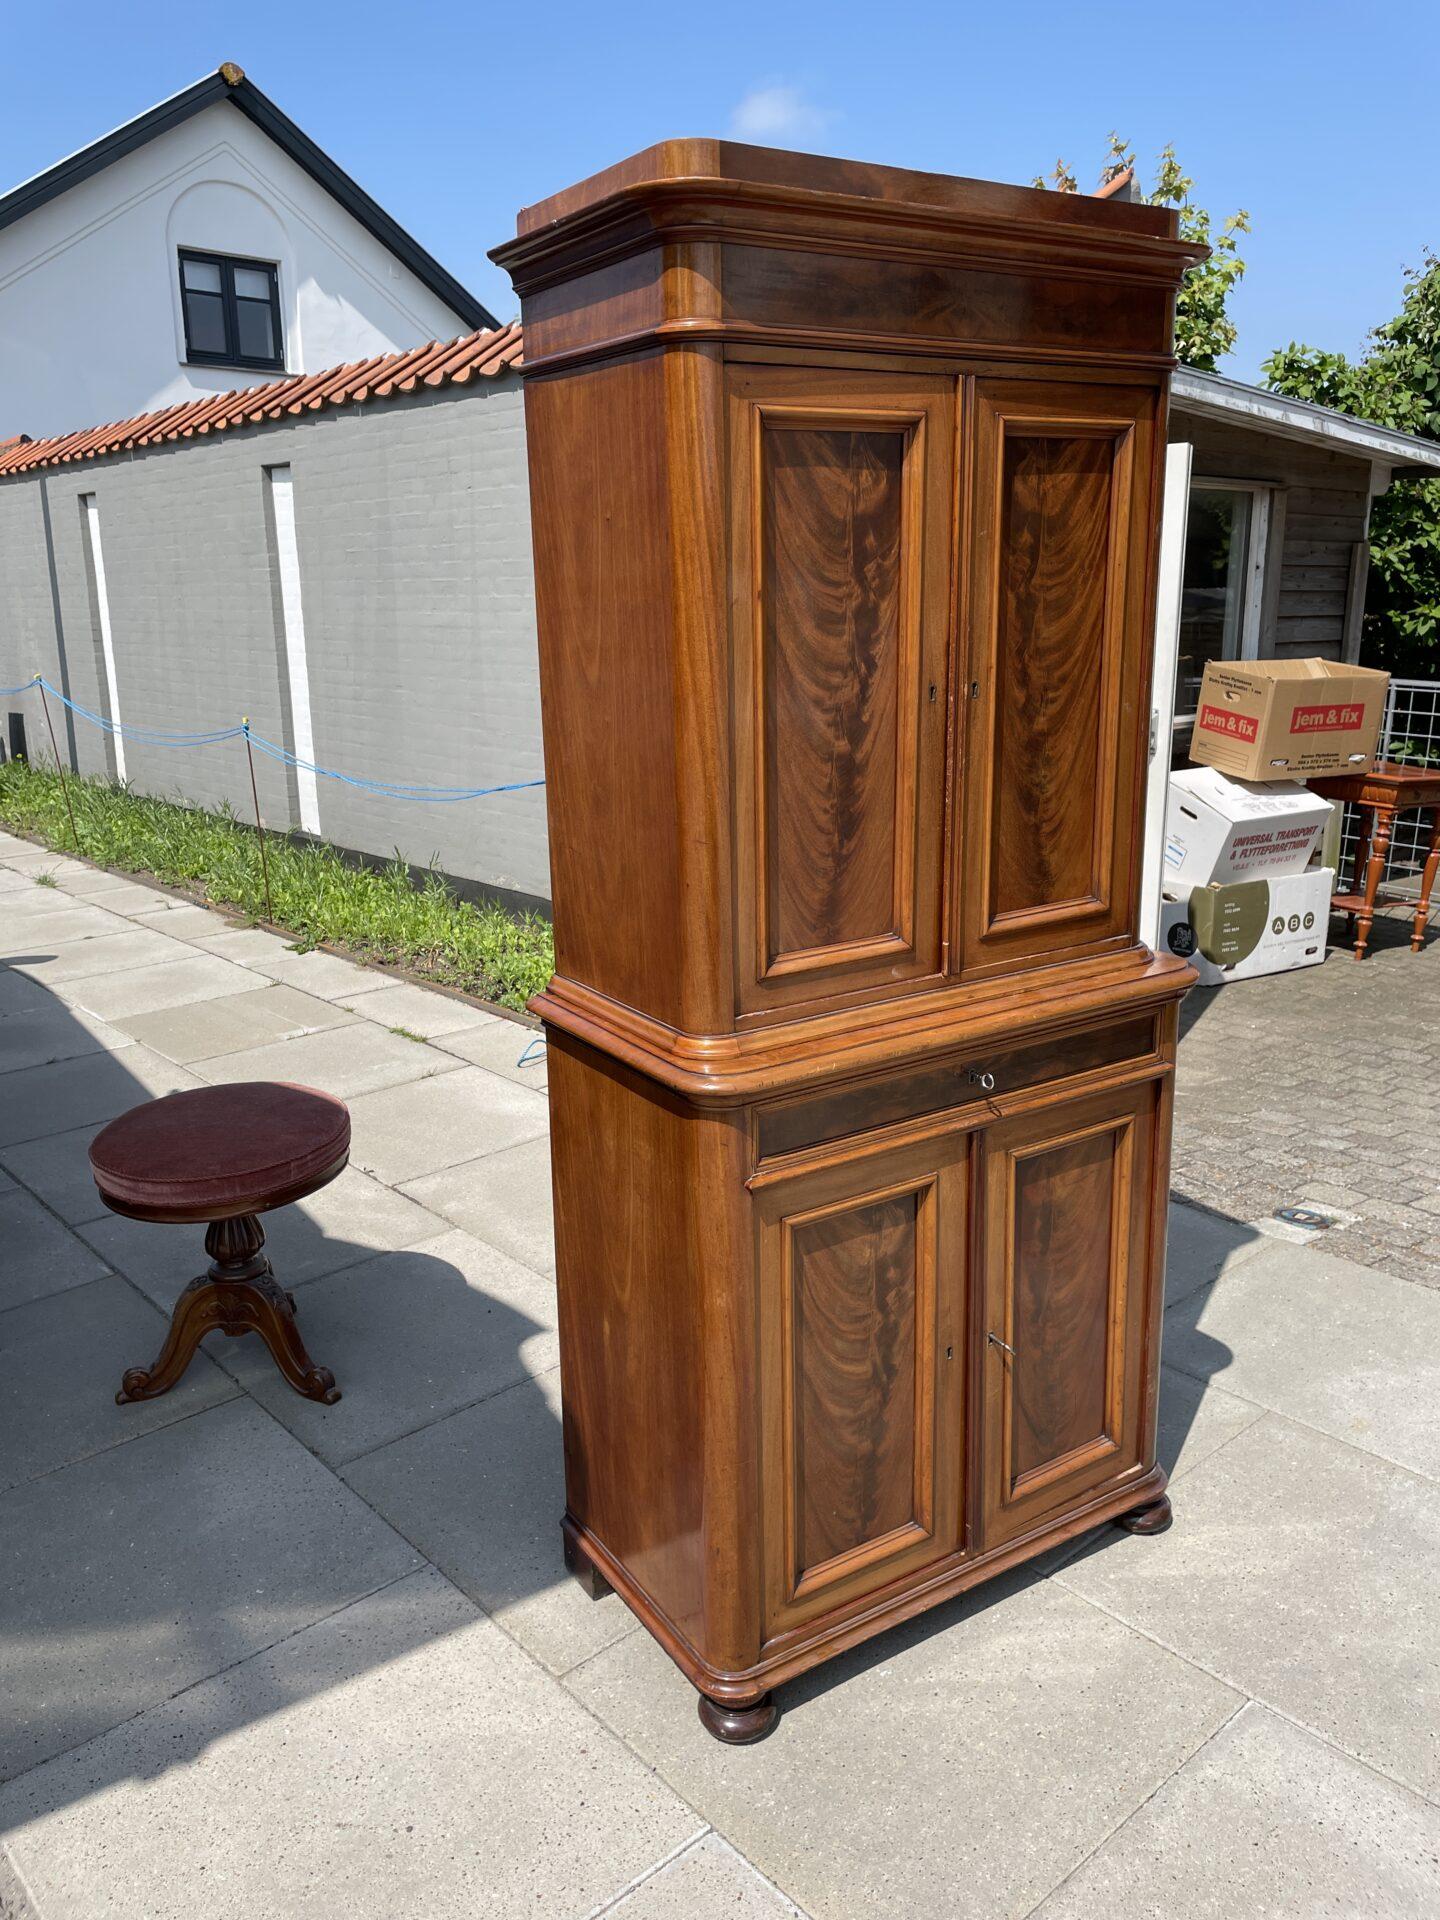 Antikt mahogniskab far 1800-tallet, velholdt, h=178 cm, b= 82 cm. Pris 1500kr